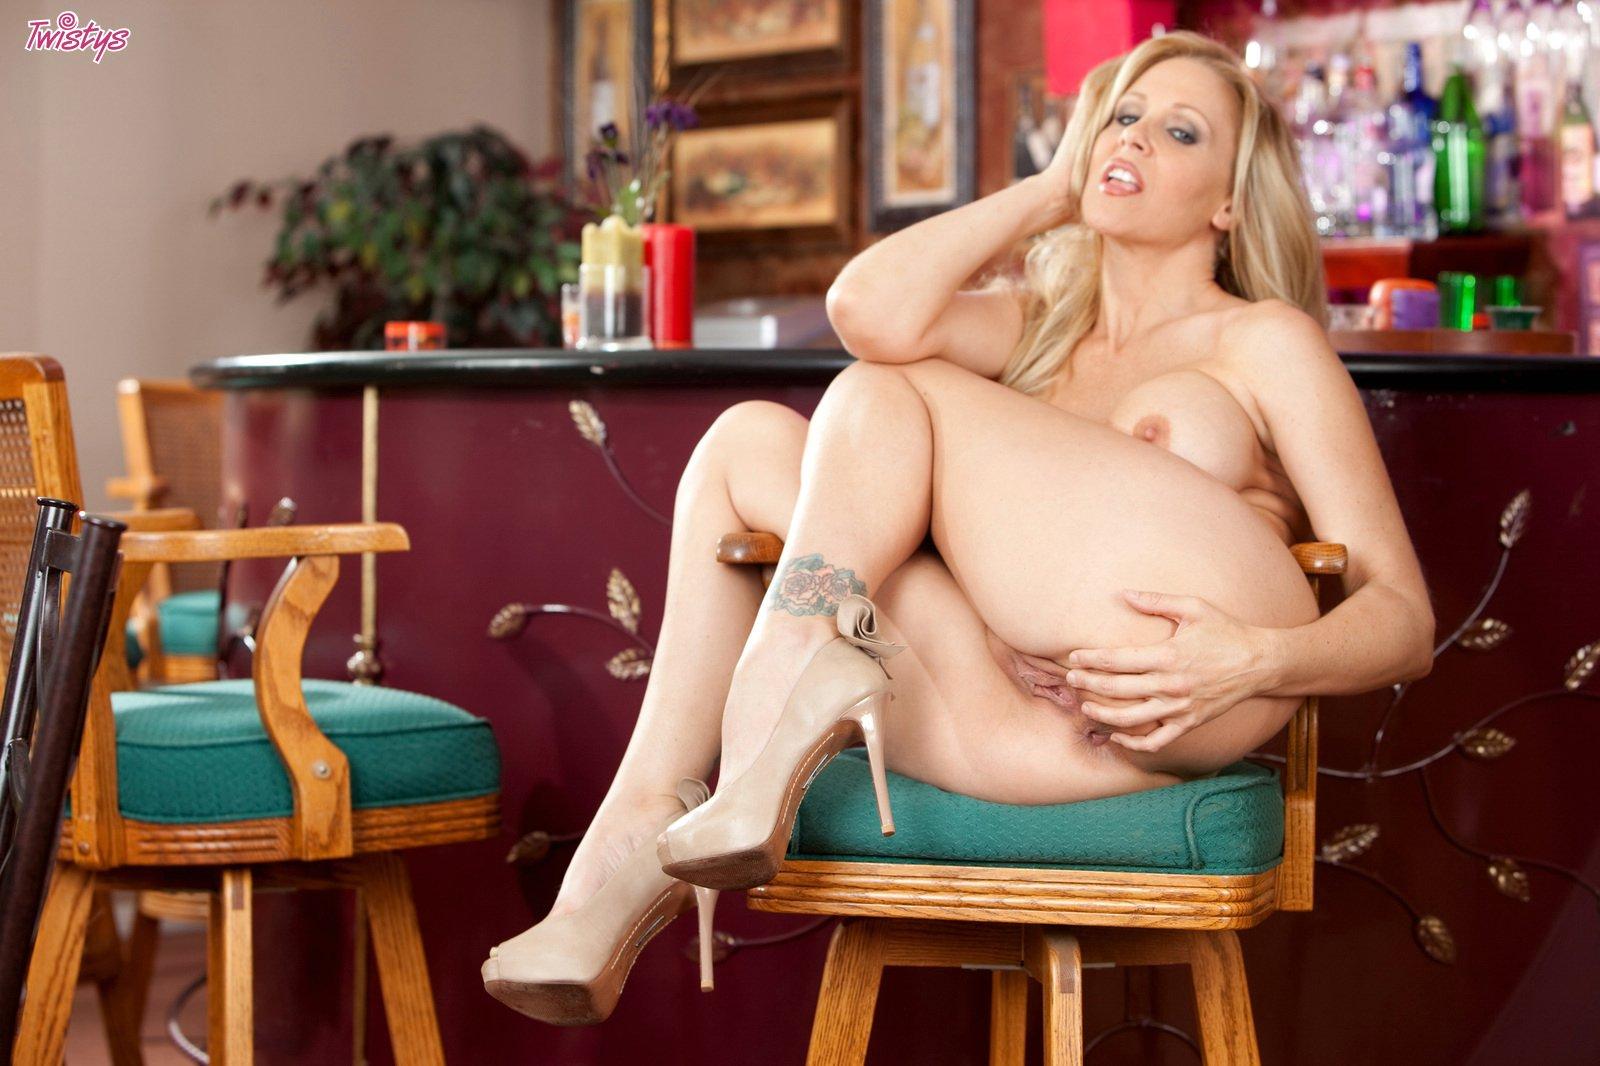 mypornstarbook net pornstars j julia ann gallery74 10